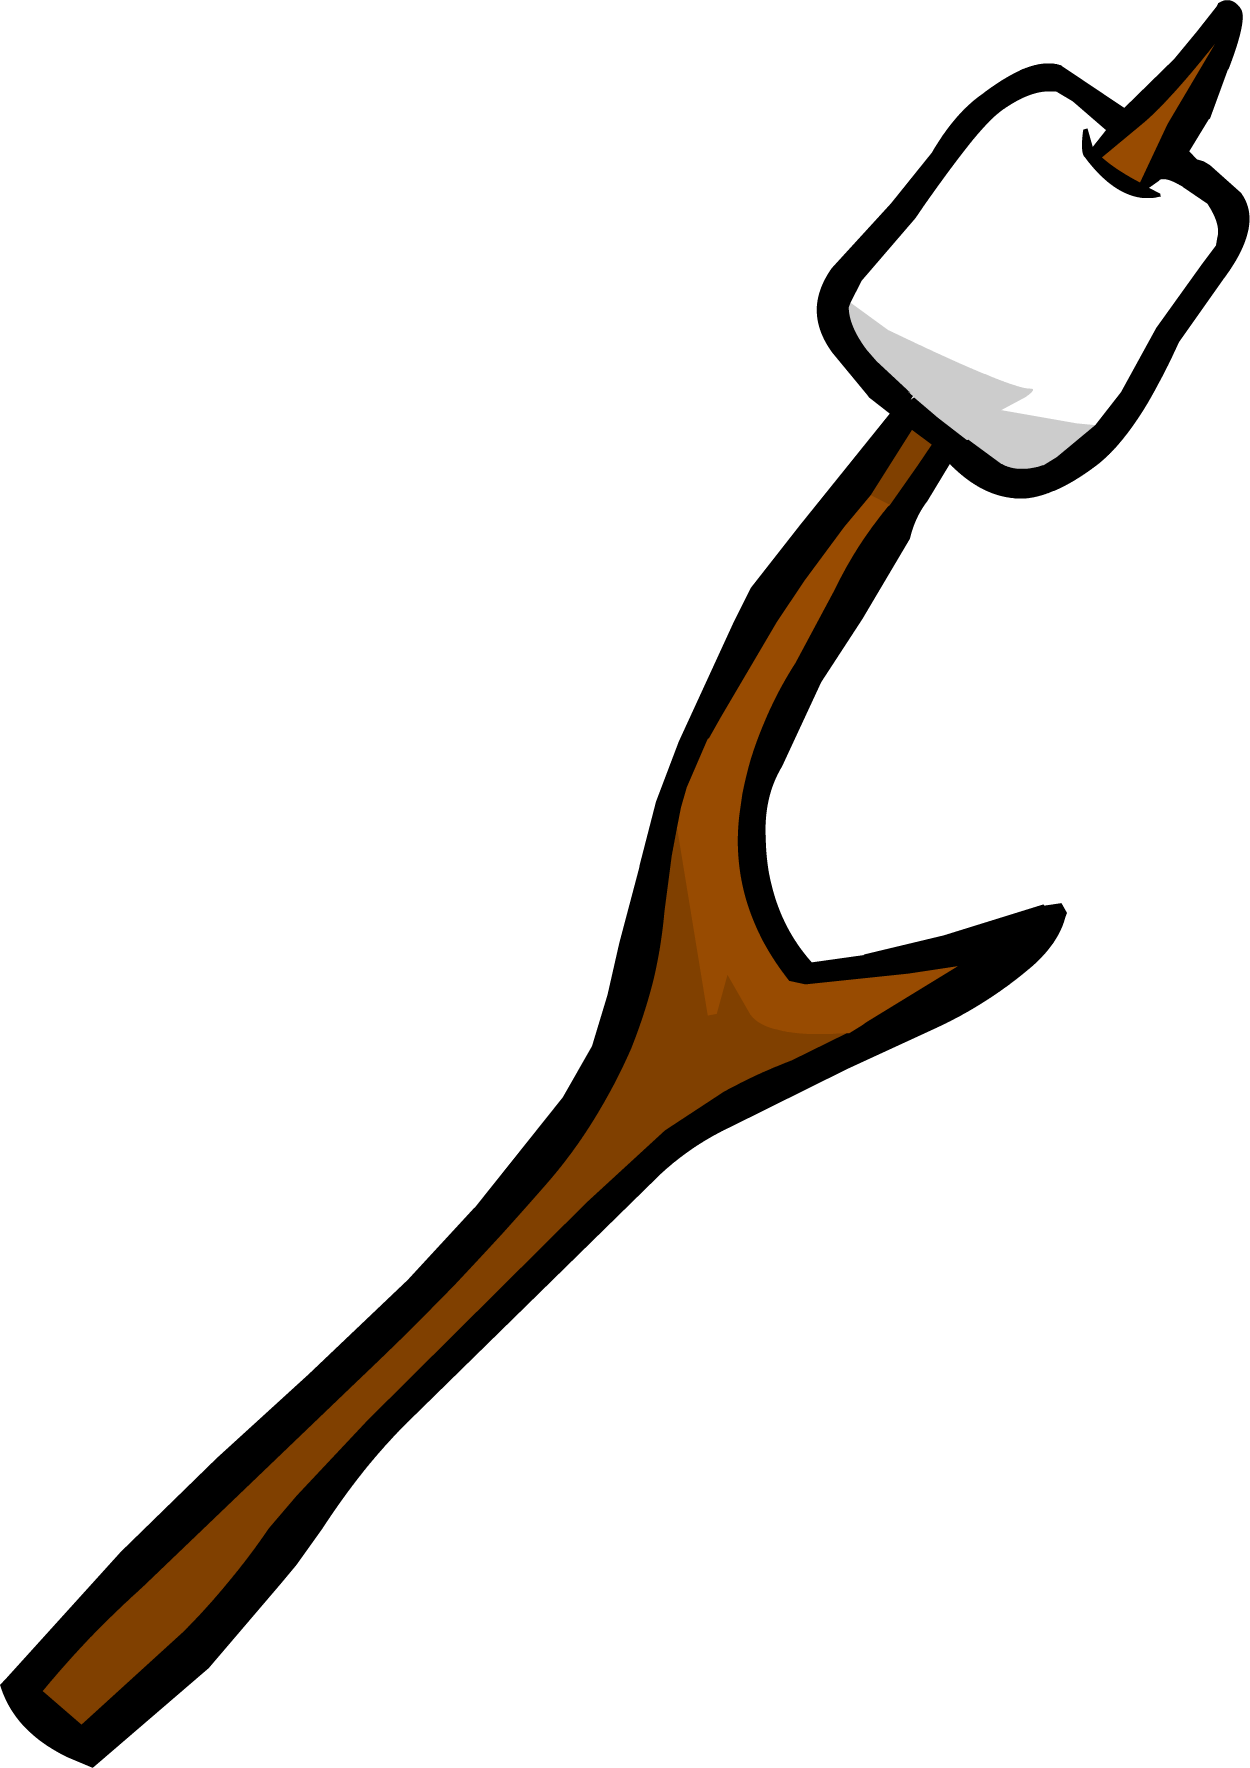 Stick Clipart